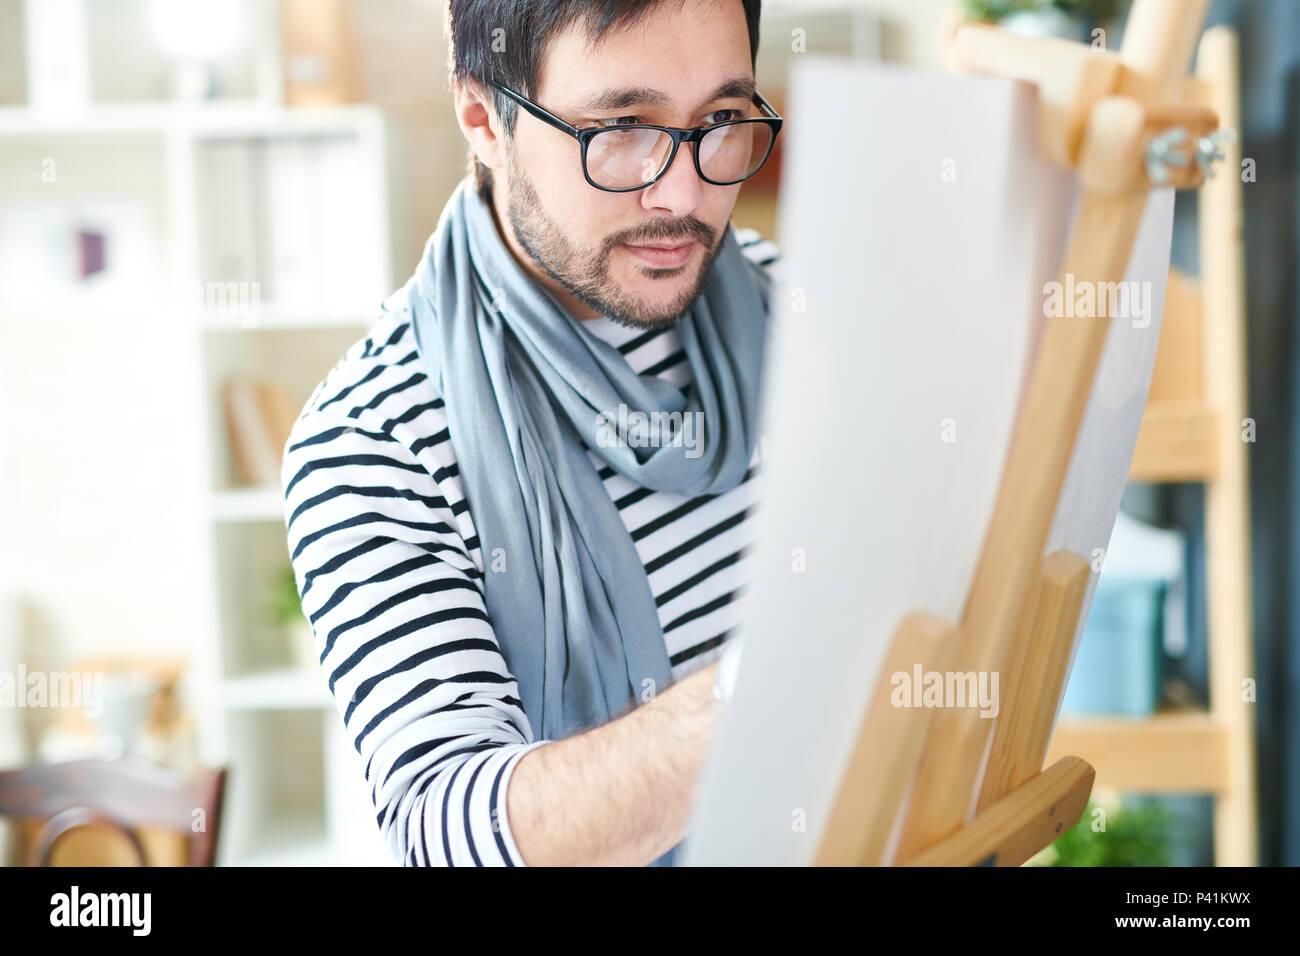 Bärtige Designer, Kunst auf Papier Stockbild